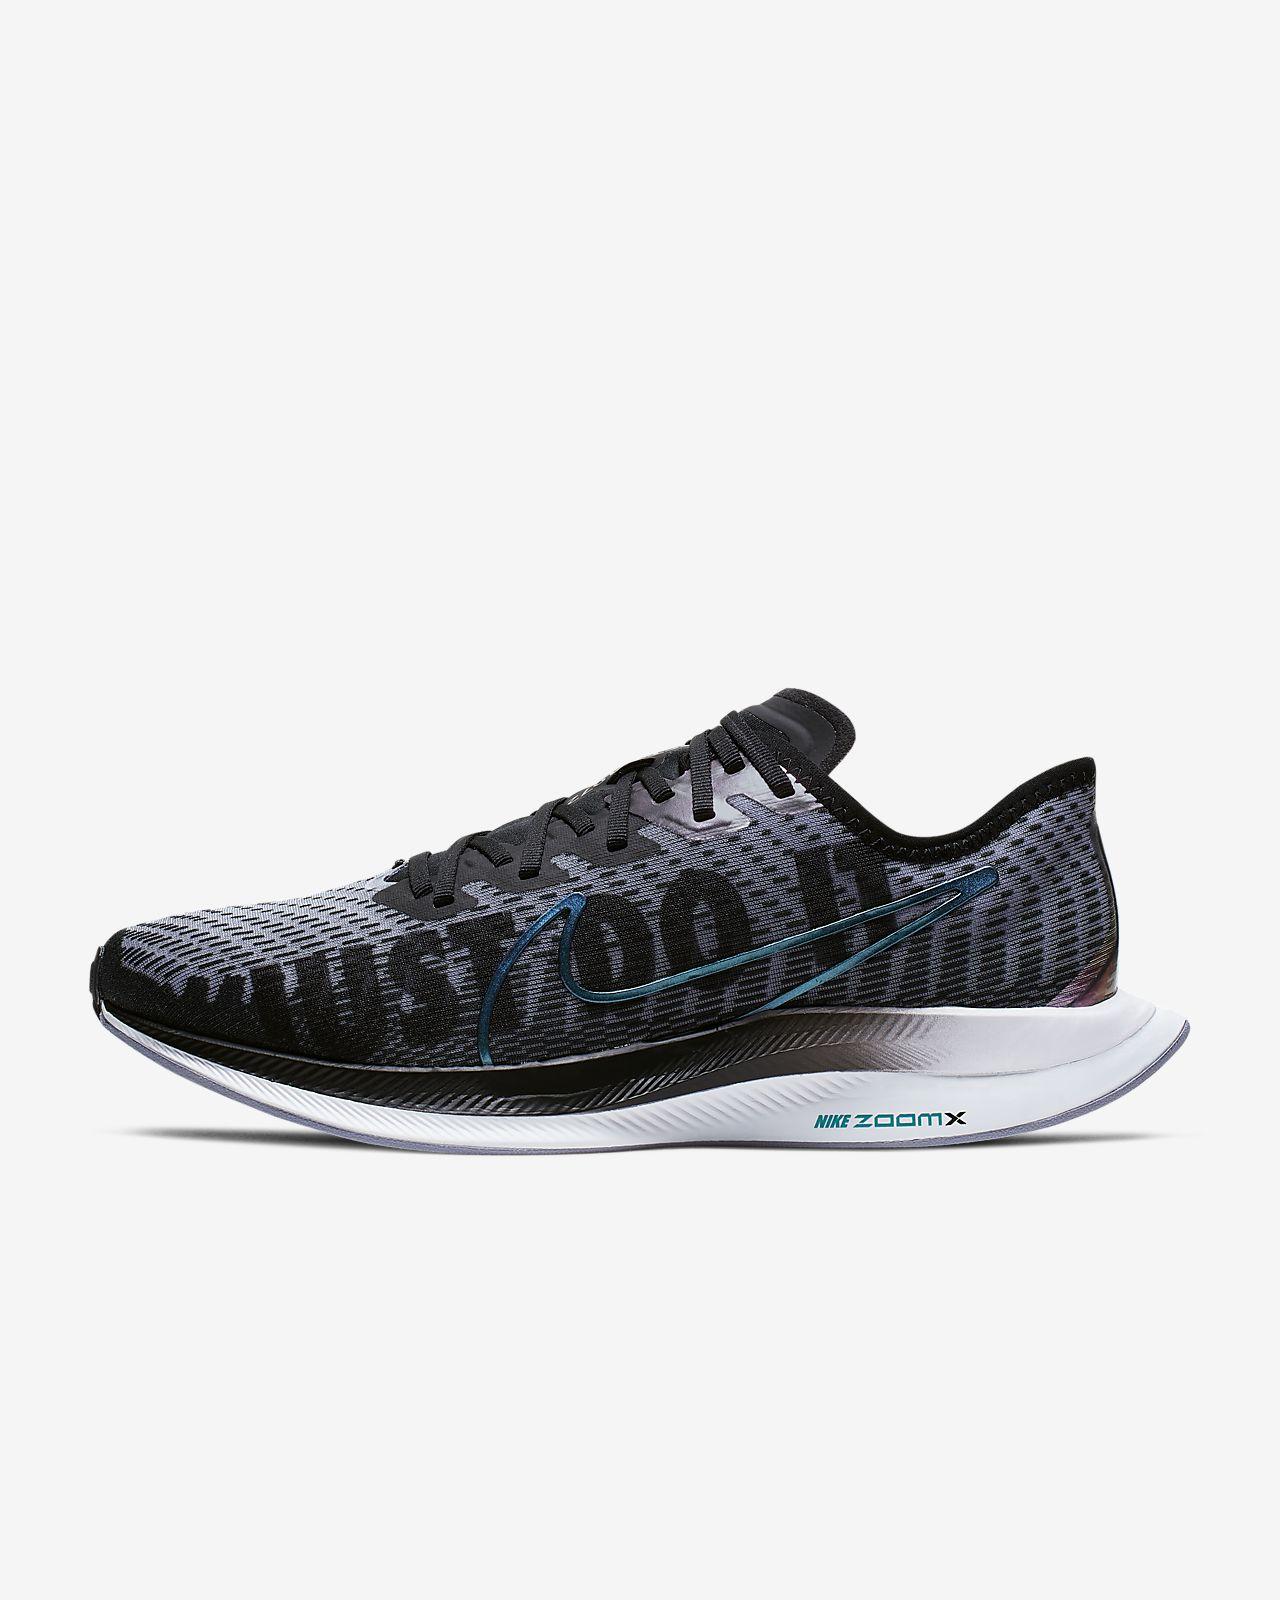 Löparsko Nike Zoom Pegasus Turbo 2 Rise för kvinnor